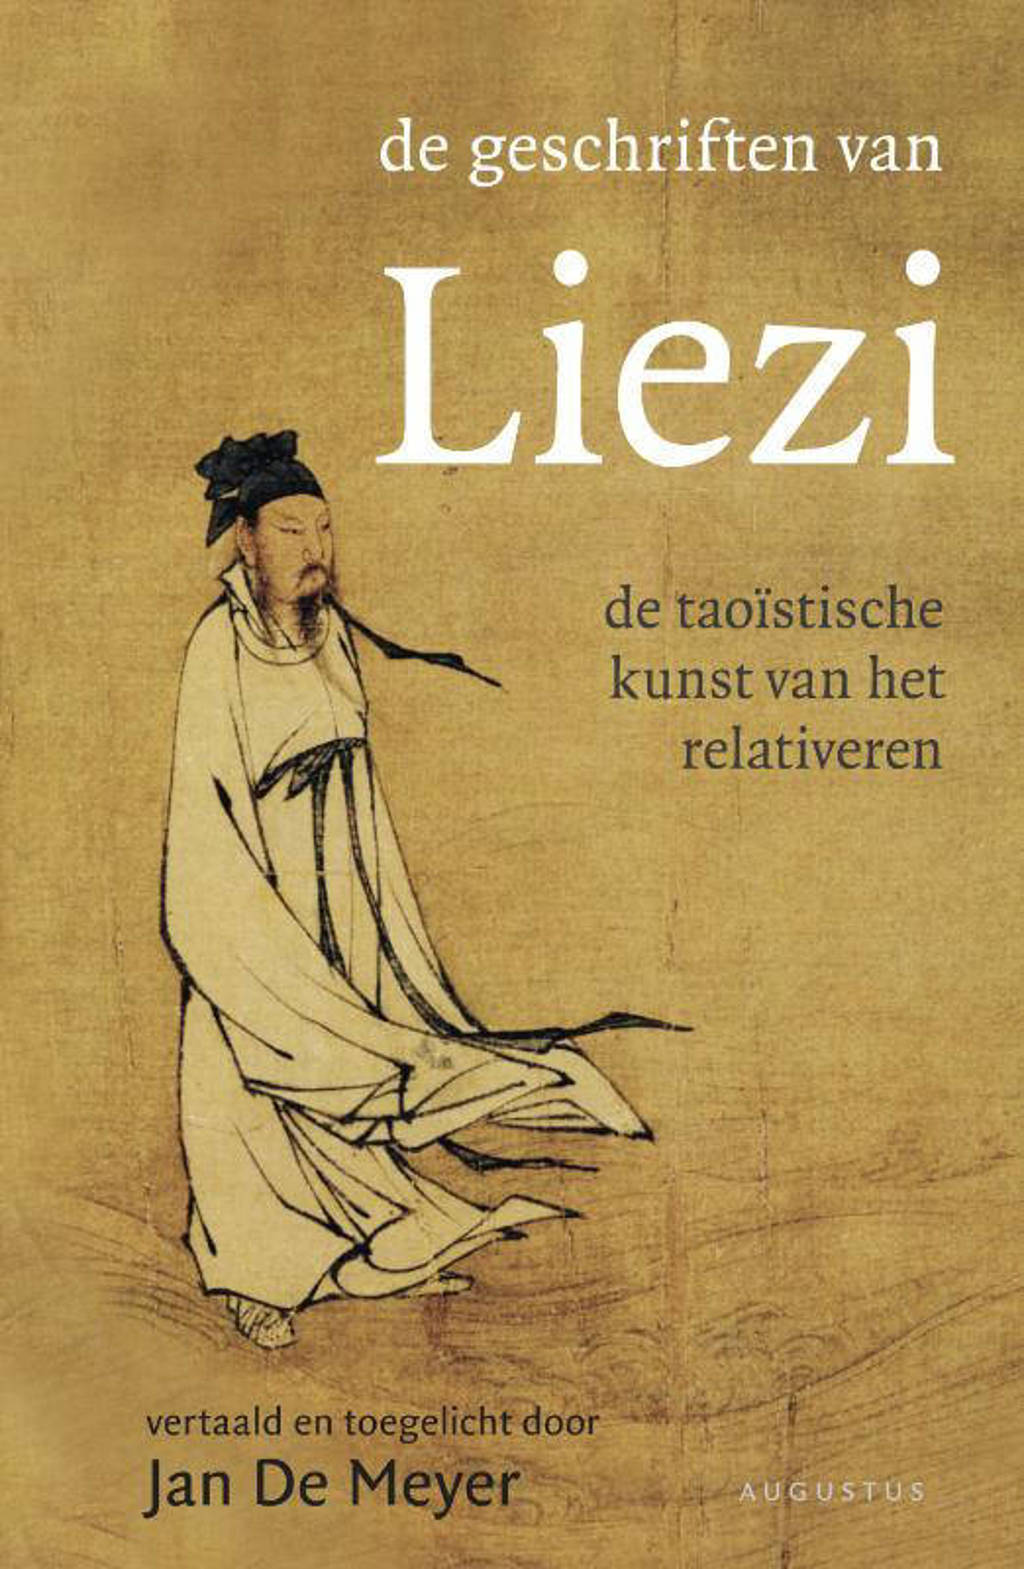 De geschriften van Liezi - Jan De Meyer